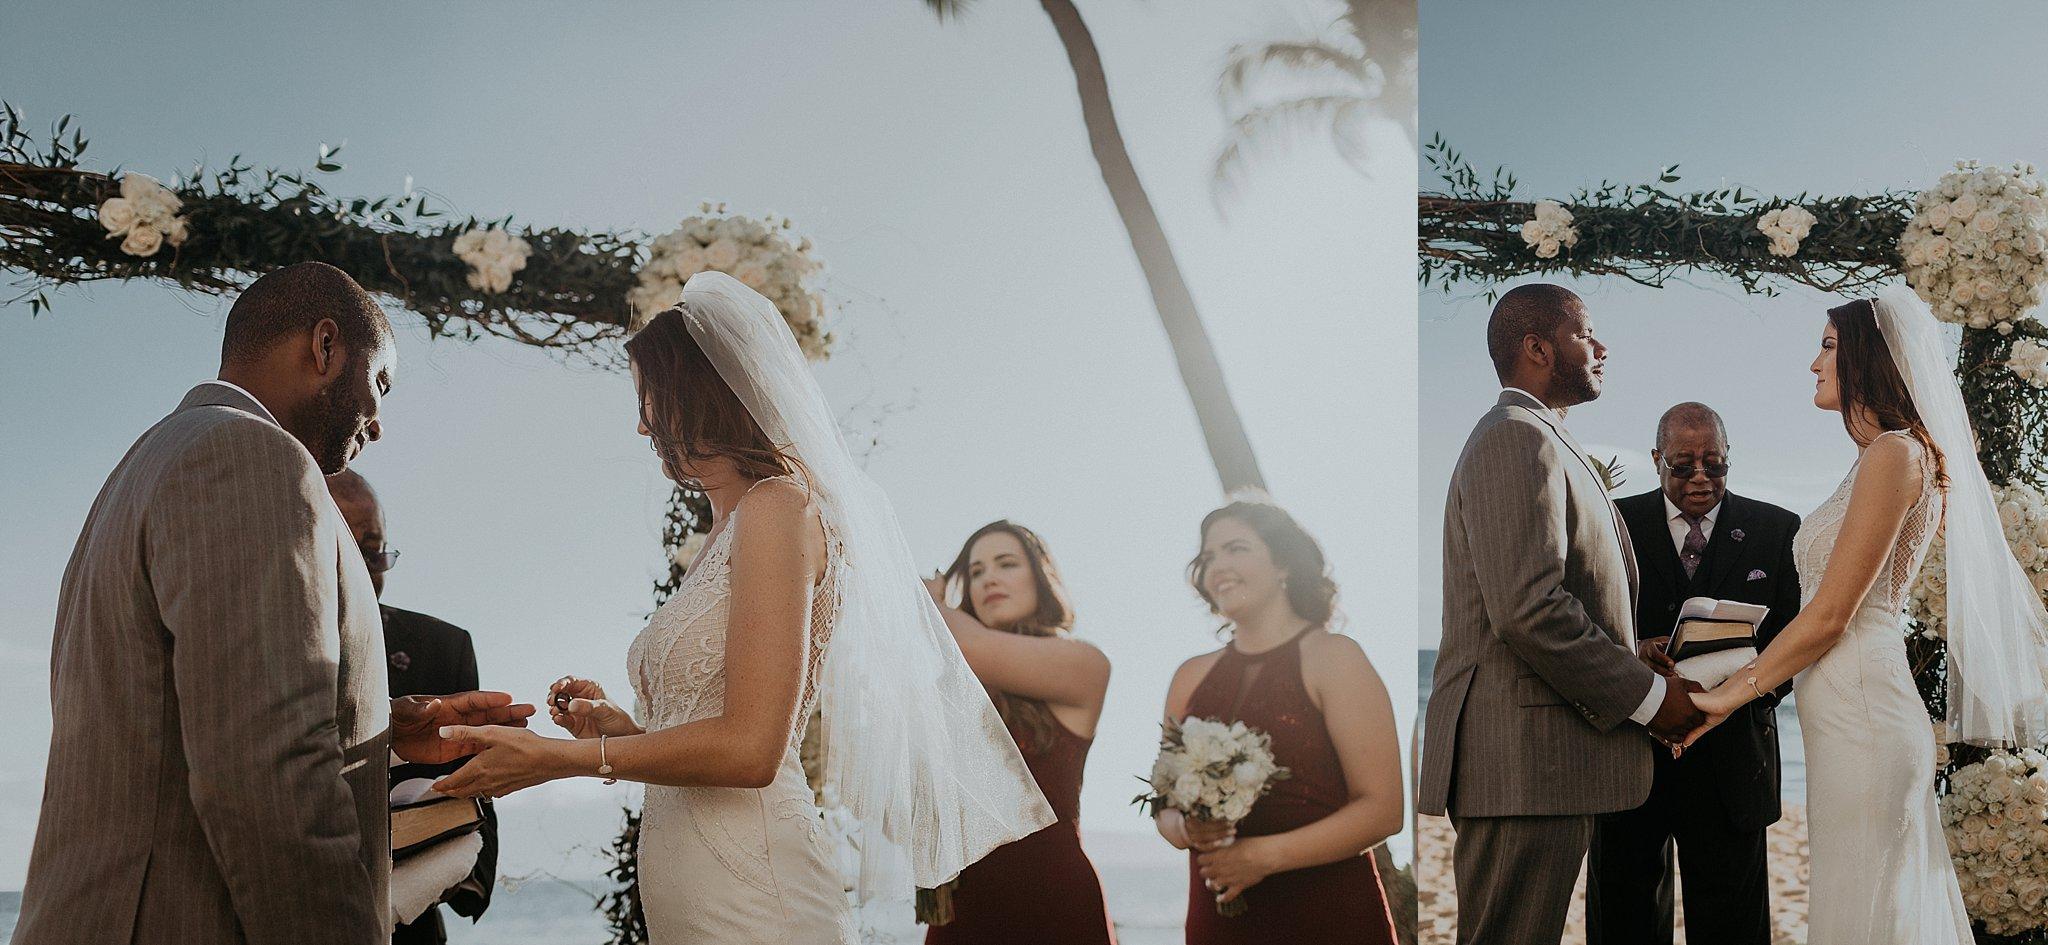 samantha_mcfarlen_bellingham_washington_engagement_photography_seattle_wedding_photographer_0210.jpg